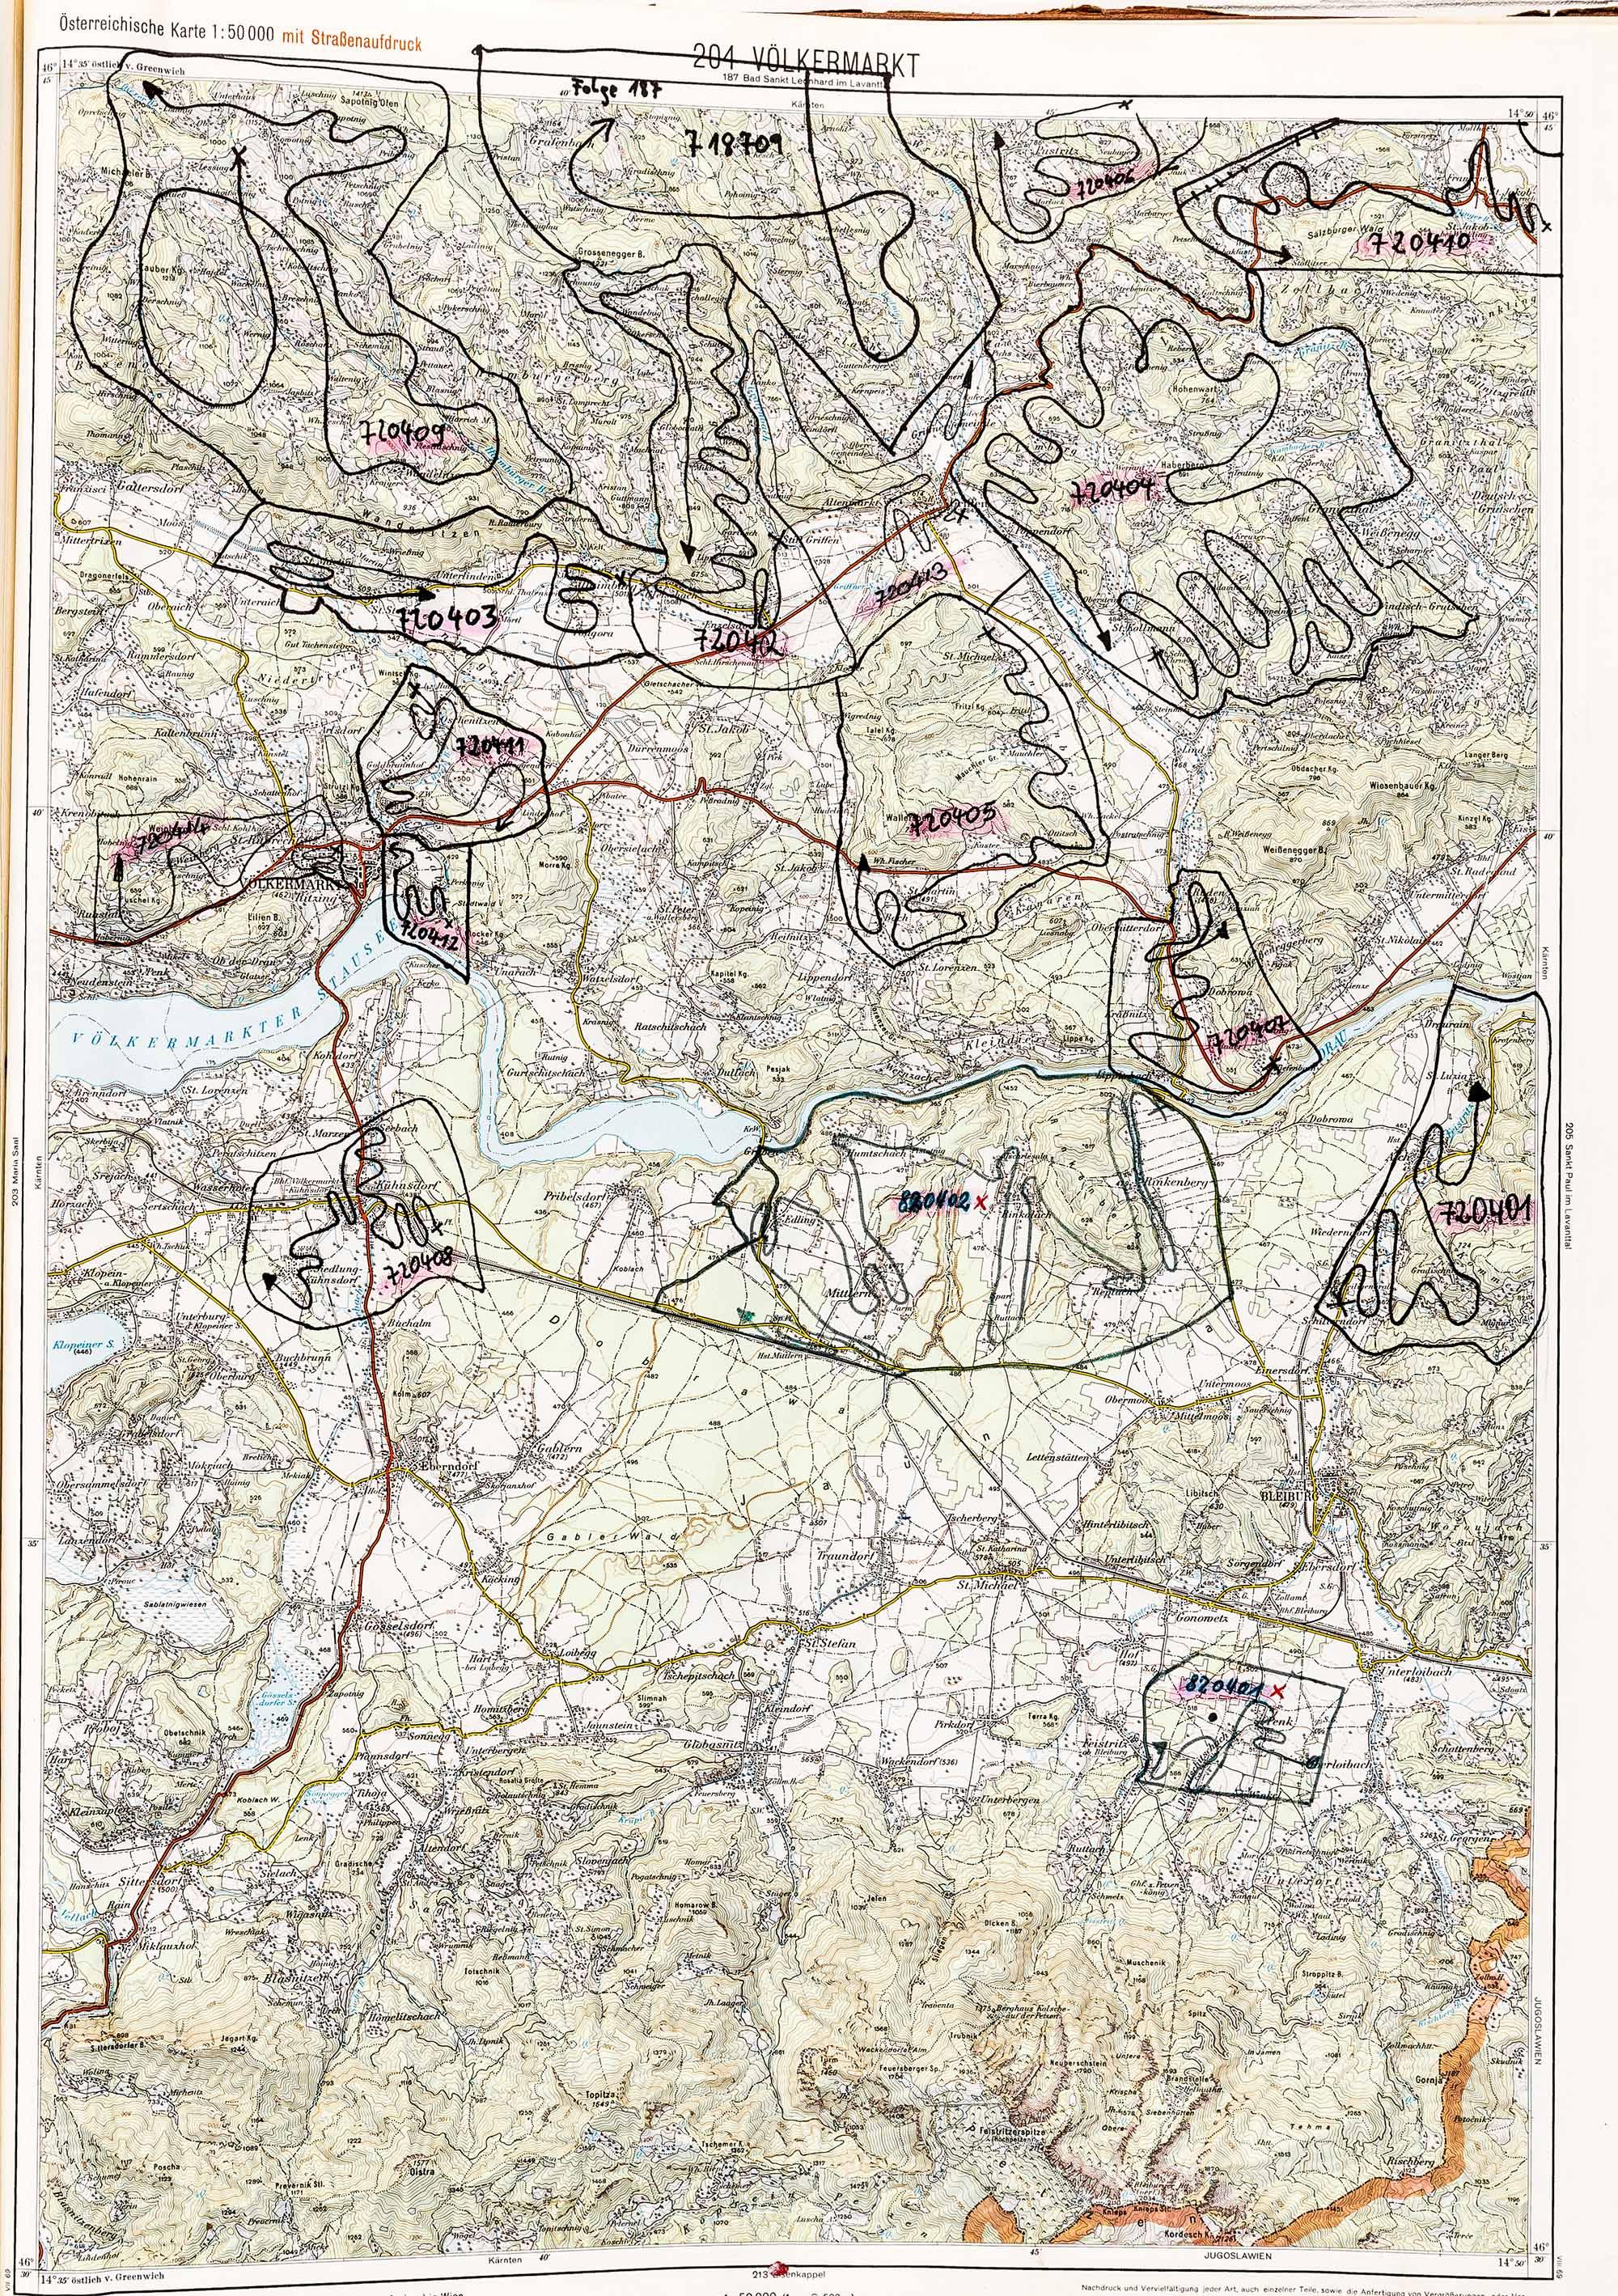 1975-1979 Karte 204